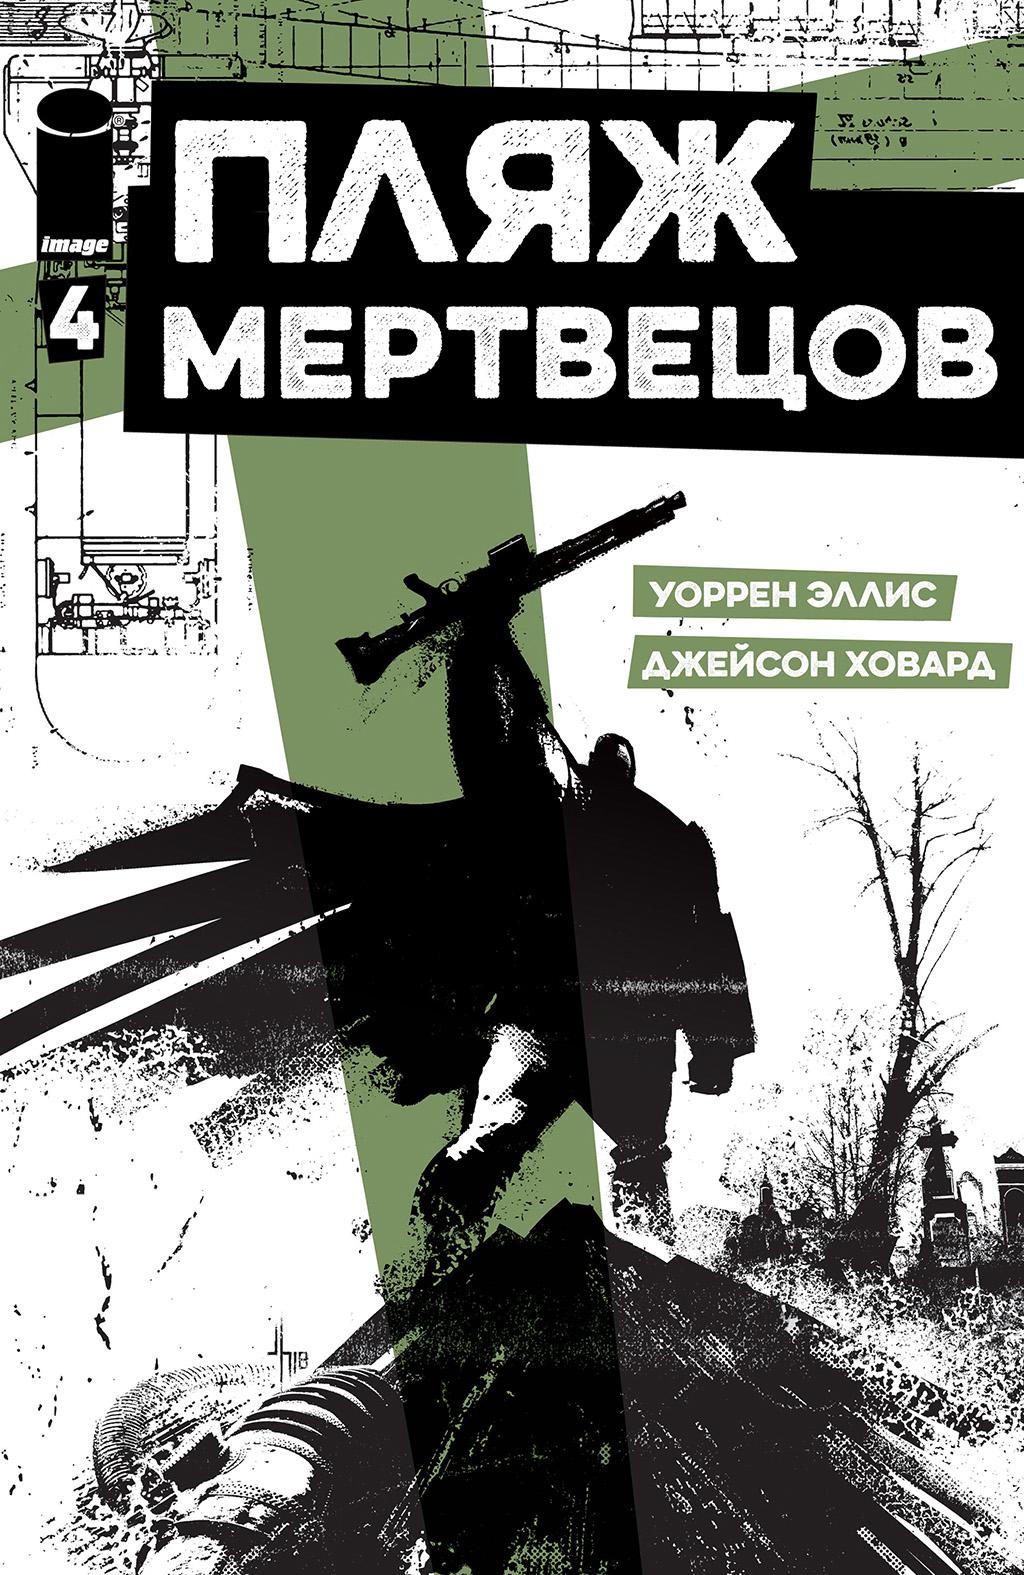 Комикс Пляж Мертвецов